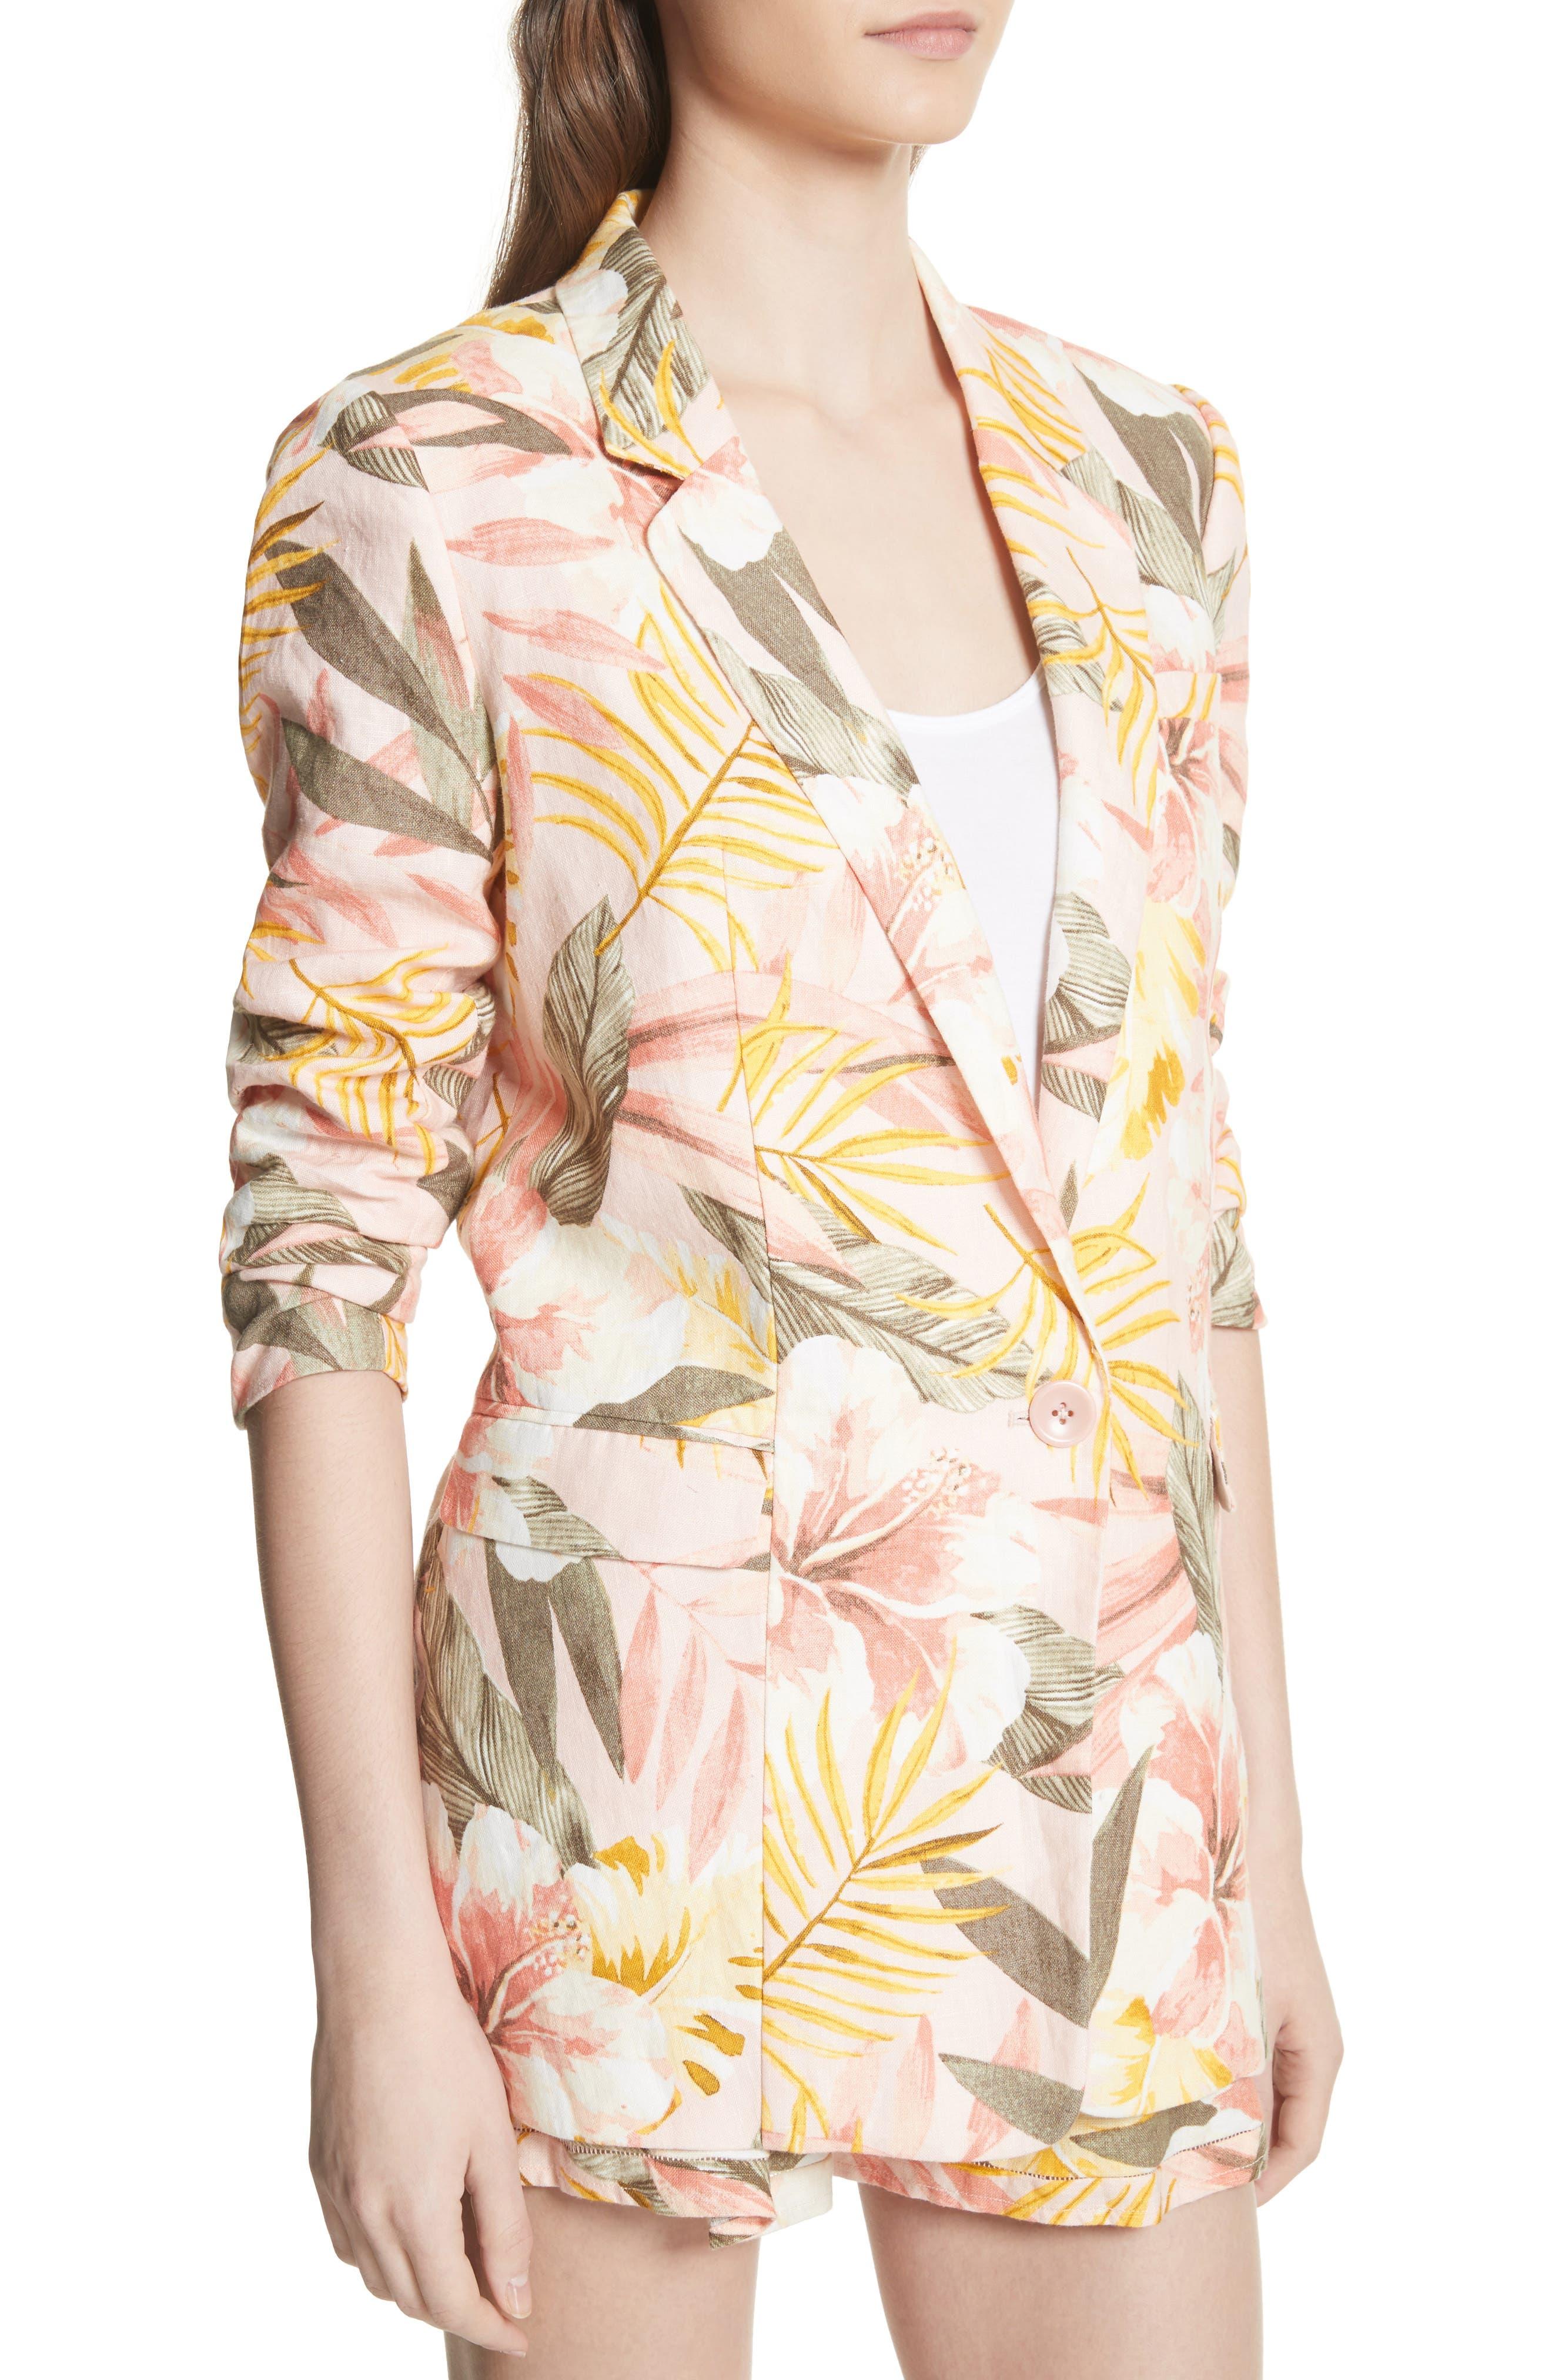 KIshina B Floral Jacket,                             Alternate thumbnail 5, color,                             Dusty Nude